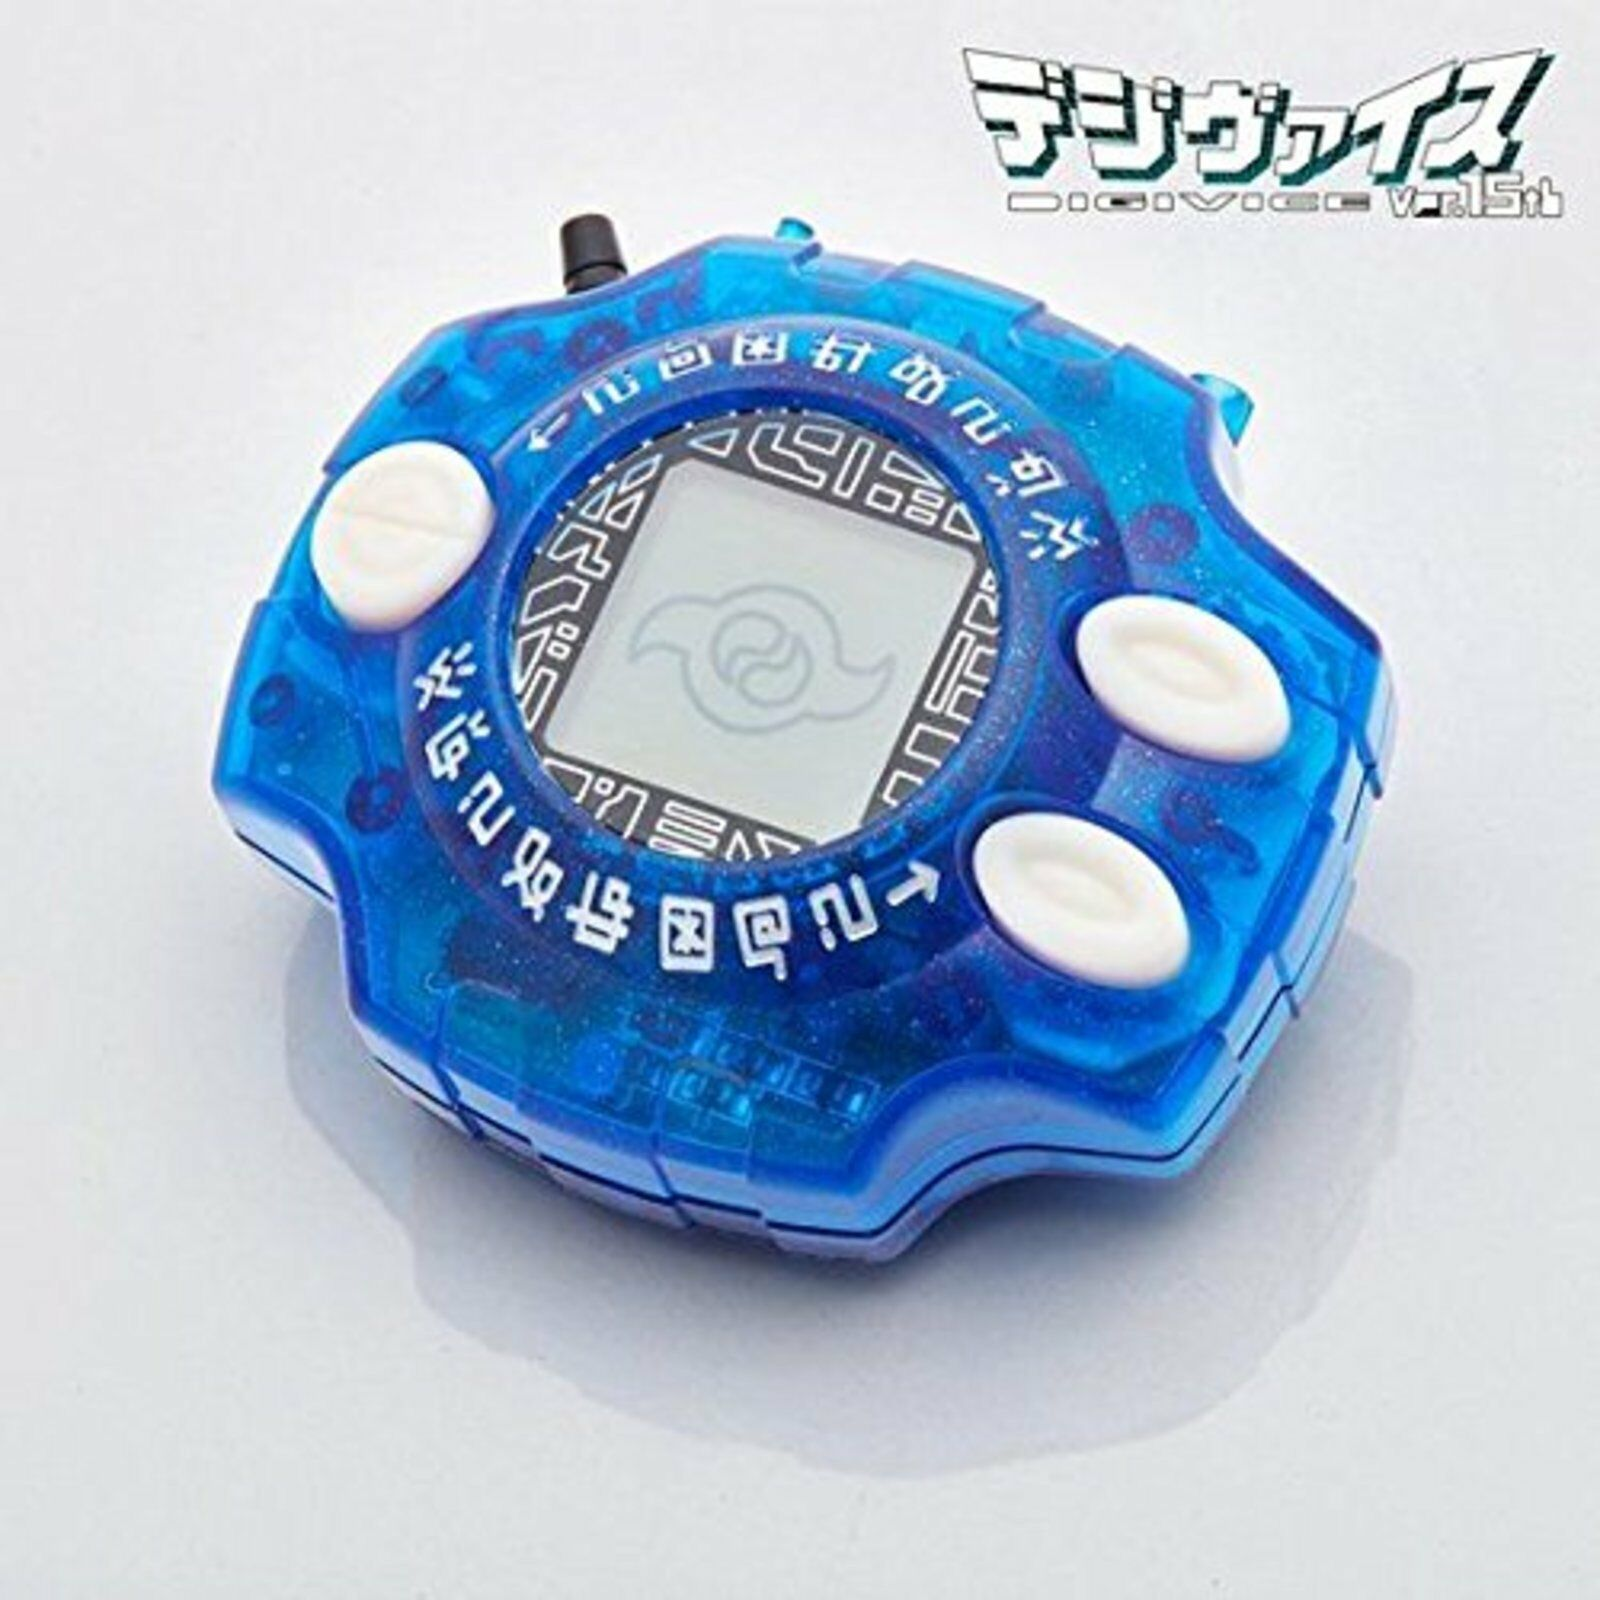 Bandai Digimon Adventure Digivice Ver 15 Metal Garurumon Color F S W  Tracking